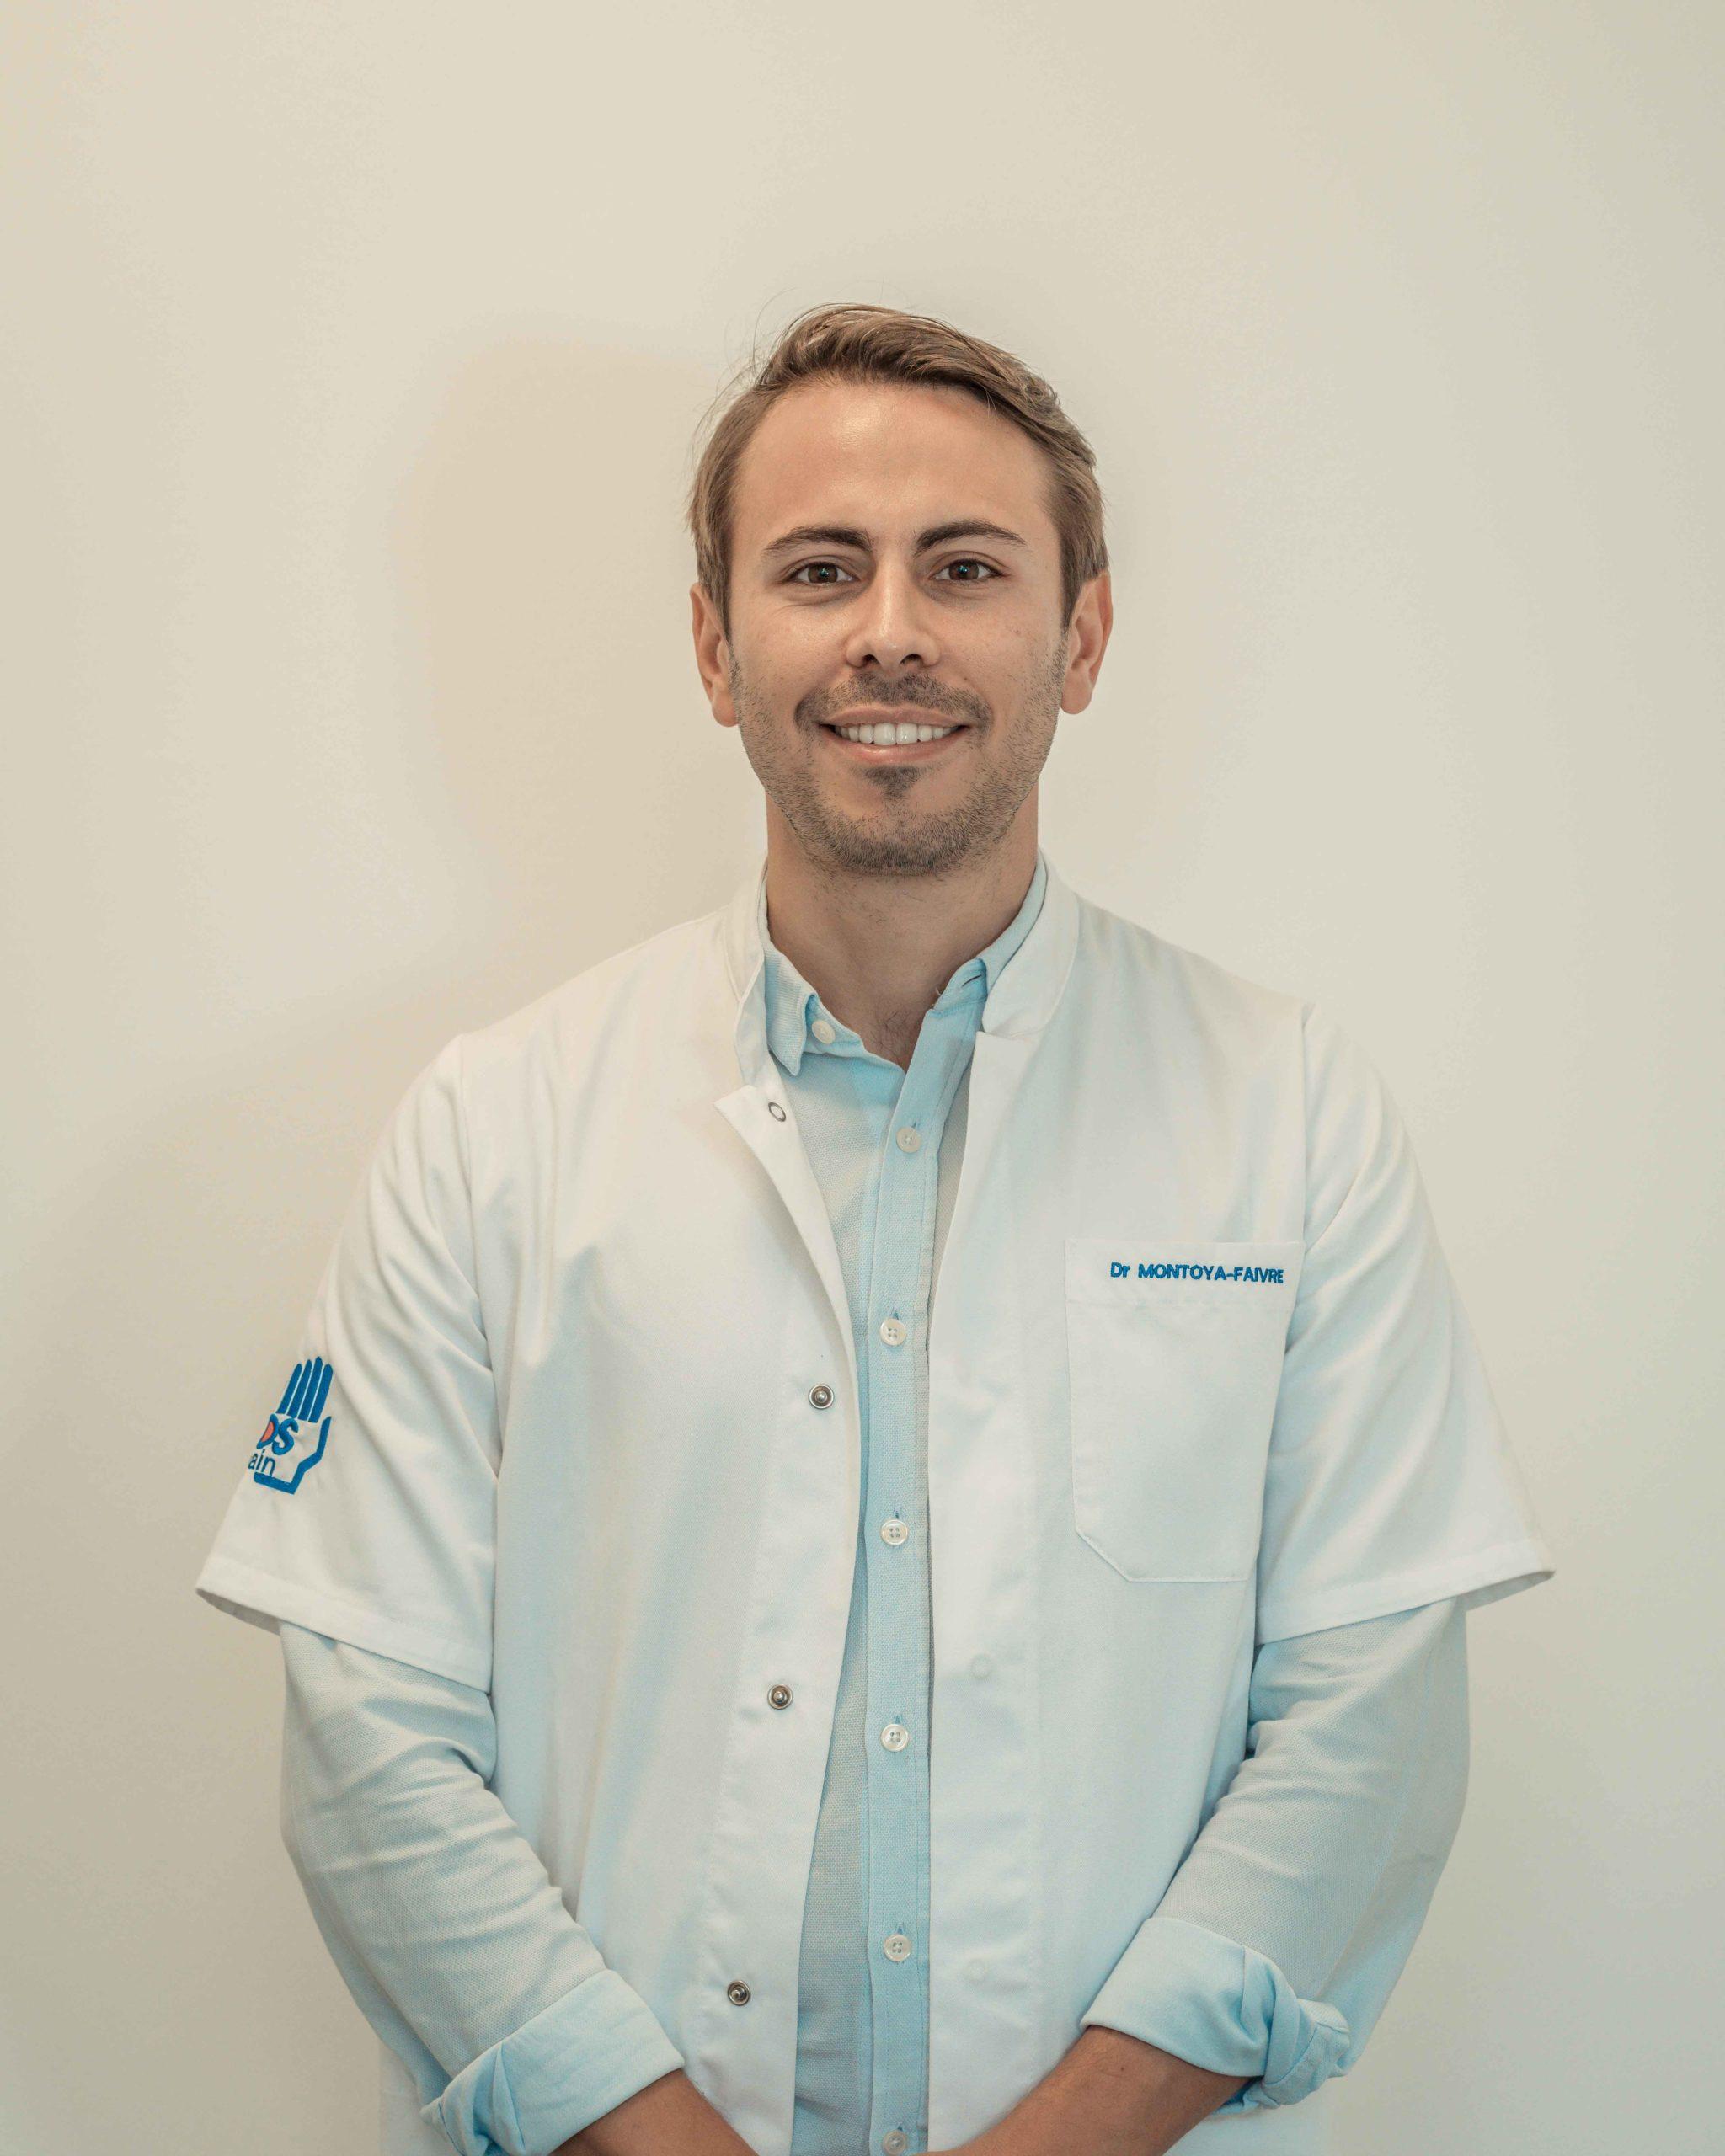 Docteur David Montoya Faivre | SOS Main